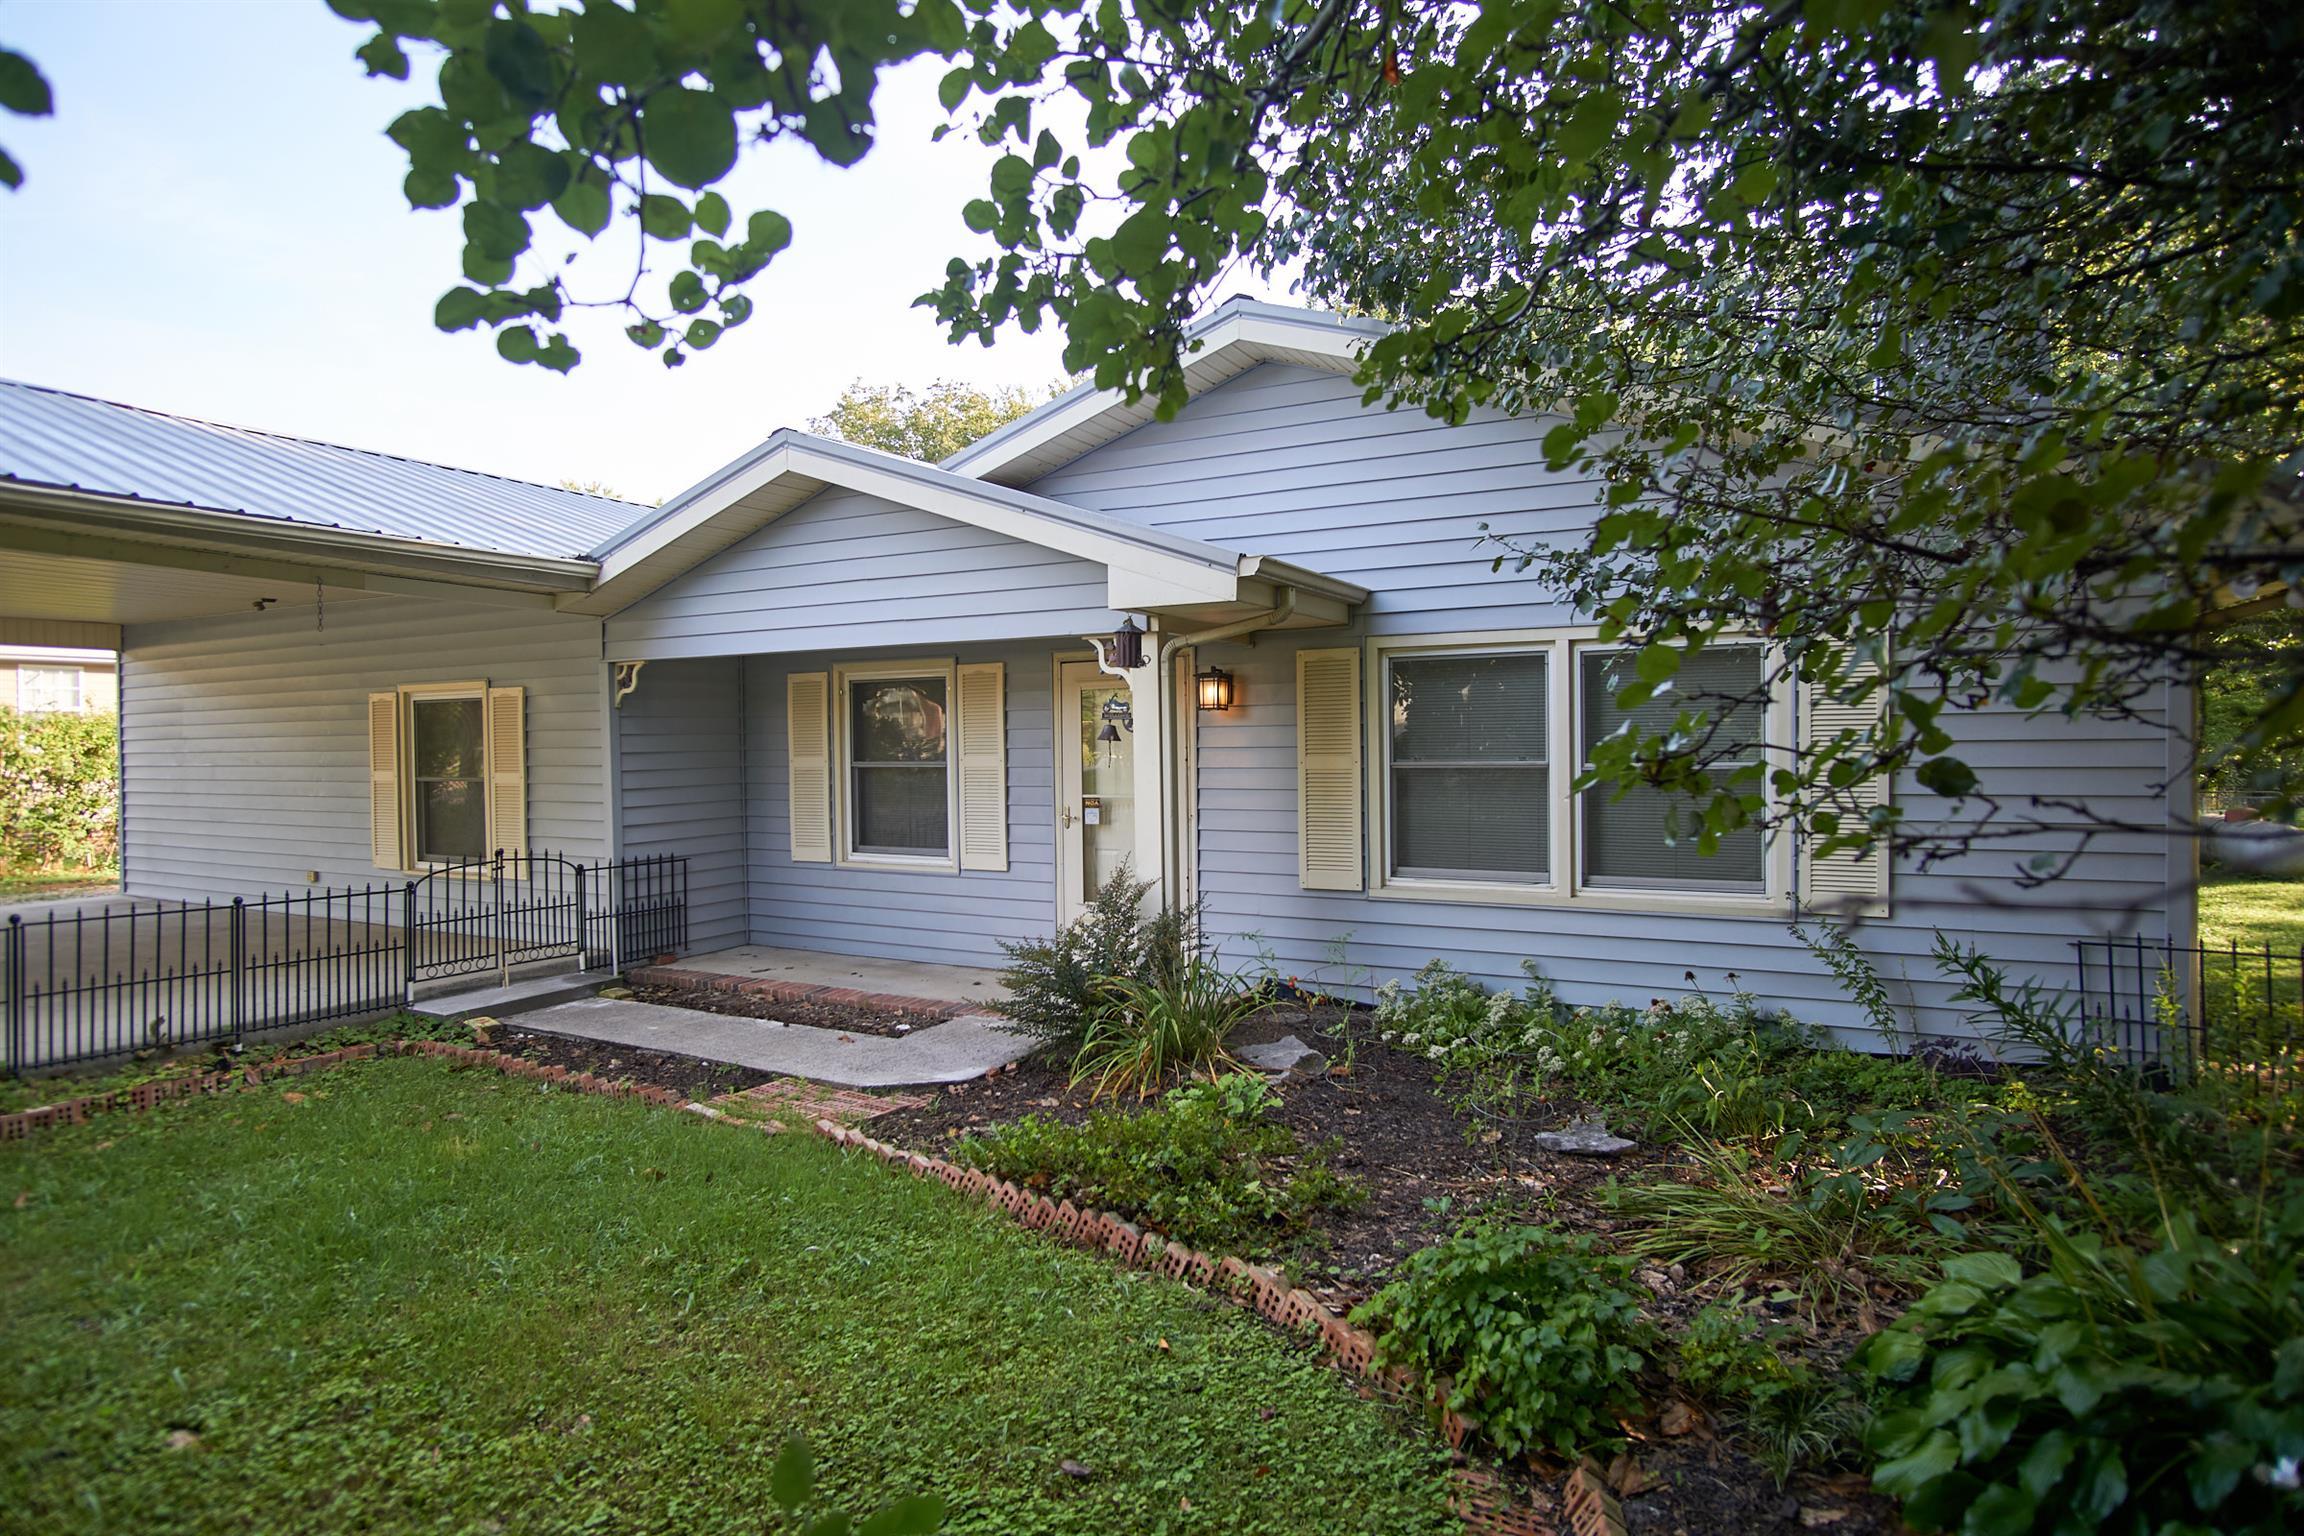 104 Carolyn Ct, Hillsboro, TN 37342 - Hillsboro, TN real estate listing